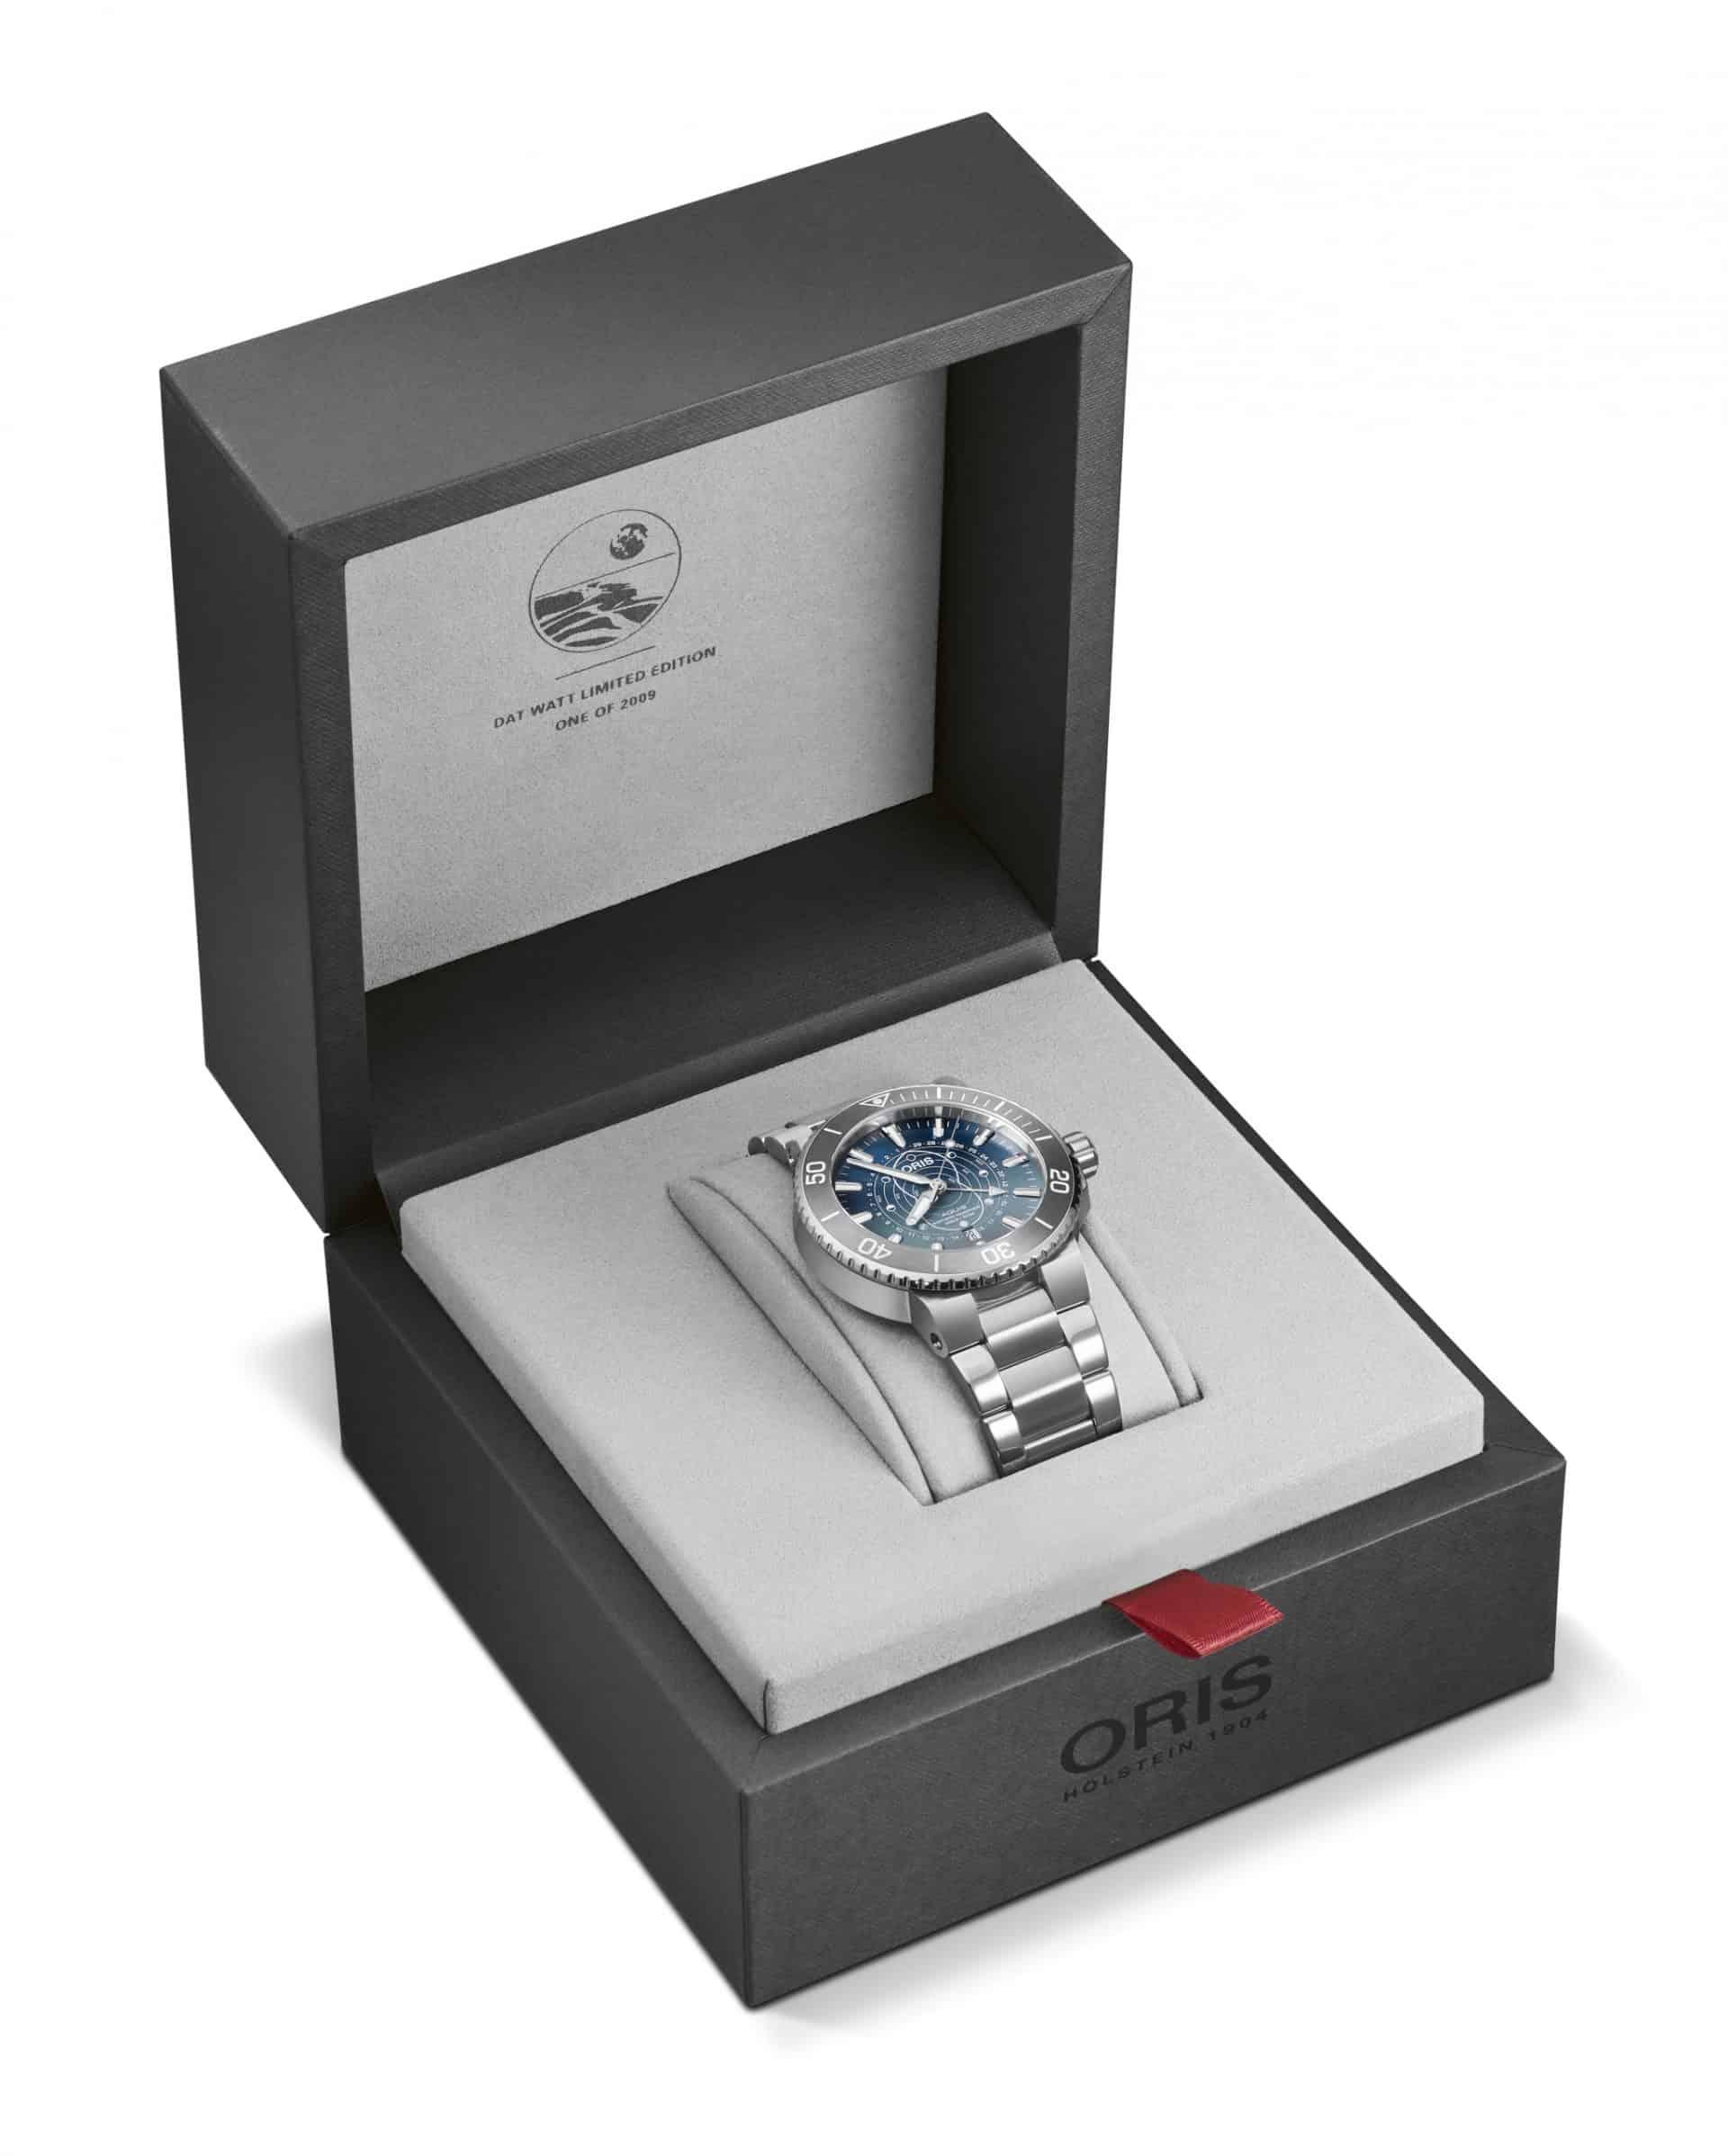 Oris Aquis Dat Watt Limited EditionRef. 01 761 7765 4185 Set